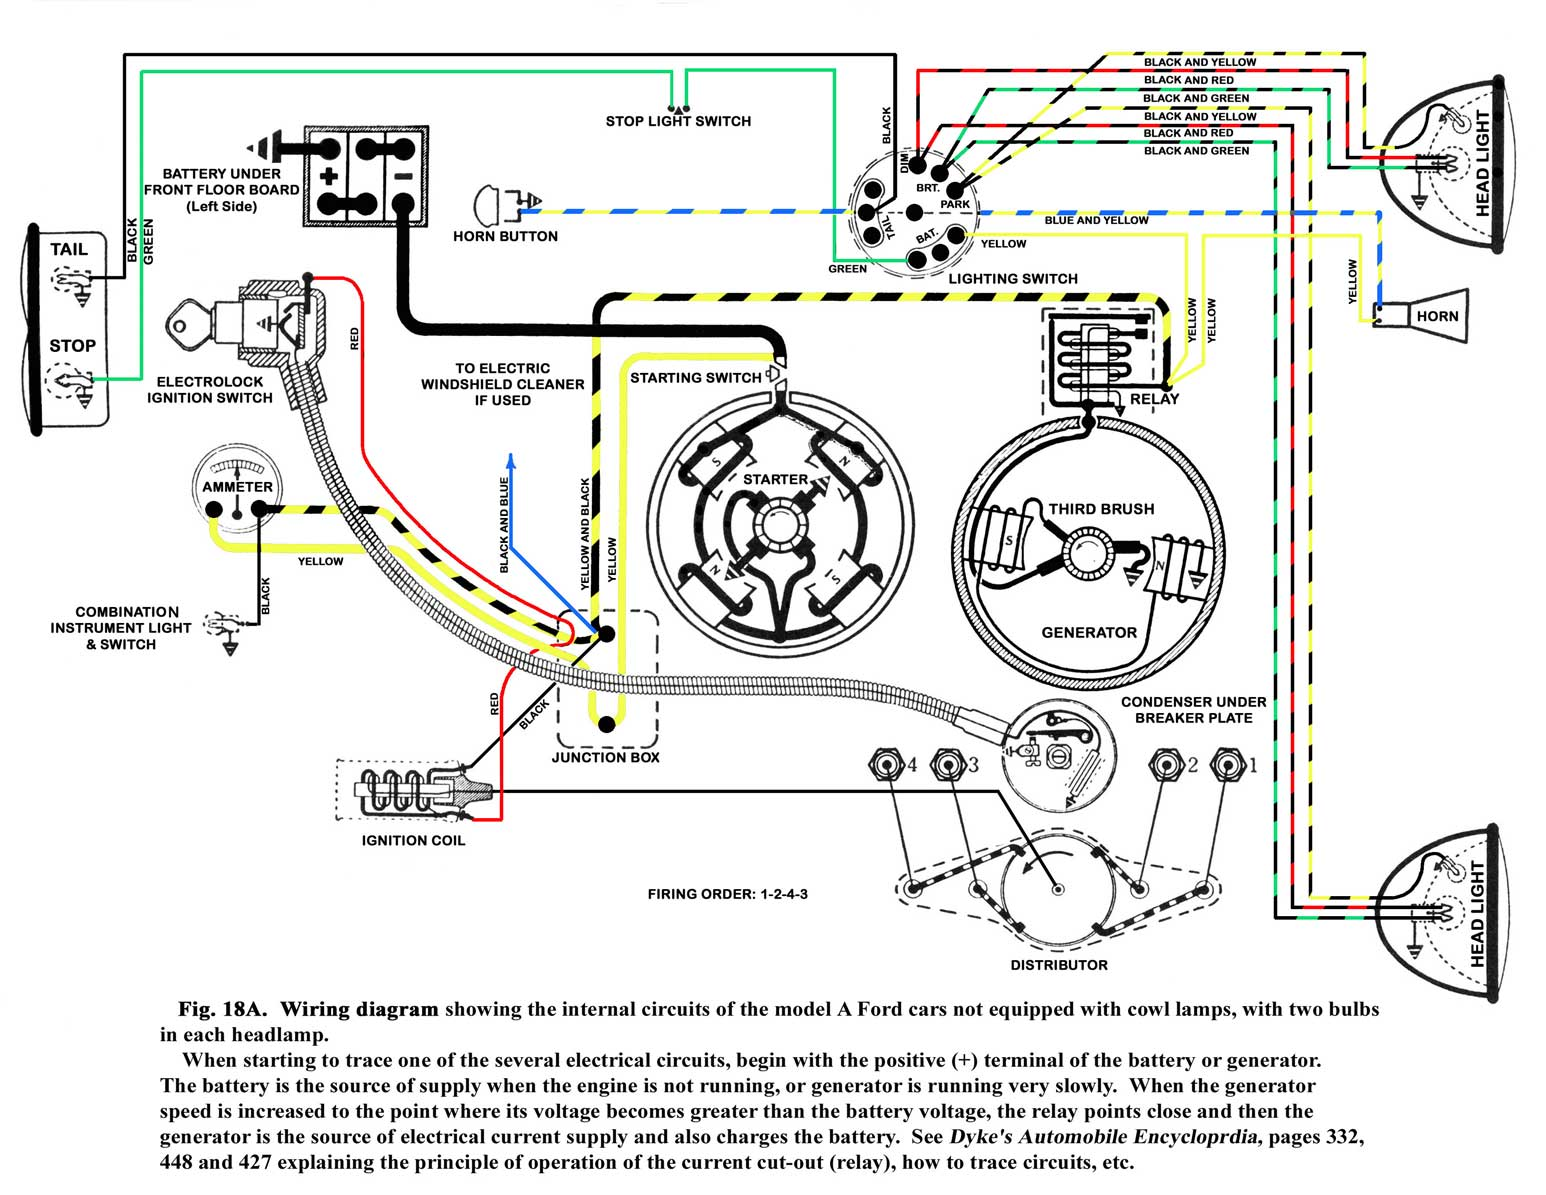 medium resolution of 12 volt generator wiring diagram wwwallischalmerscom forum ford tractor ignition switch wiring http wwwpic2flycom ford